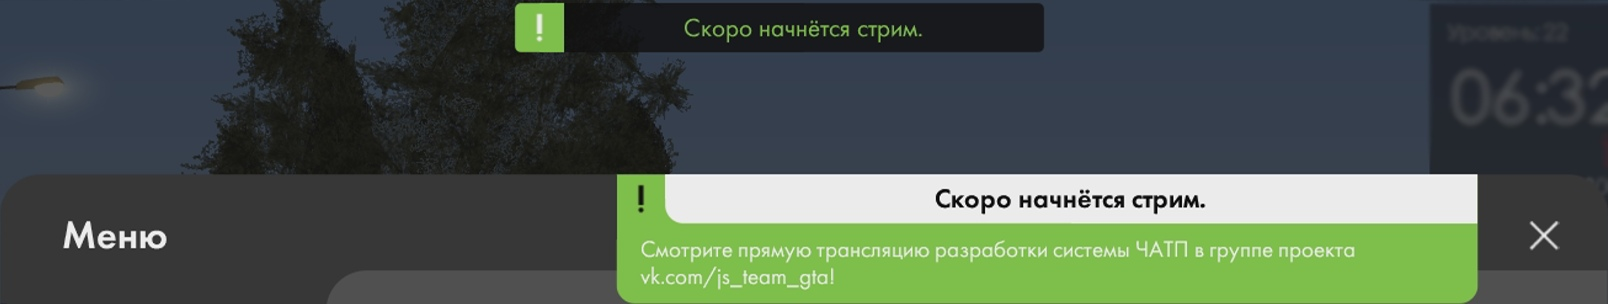 3qXFepxdX54.jpg